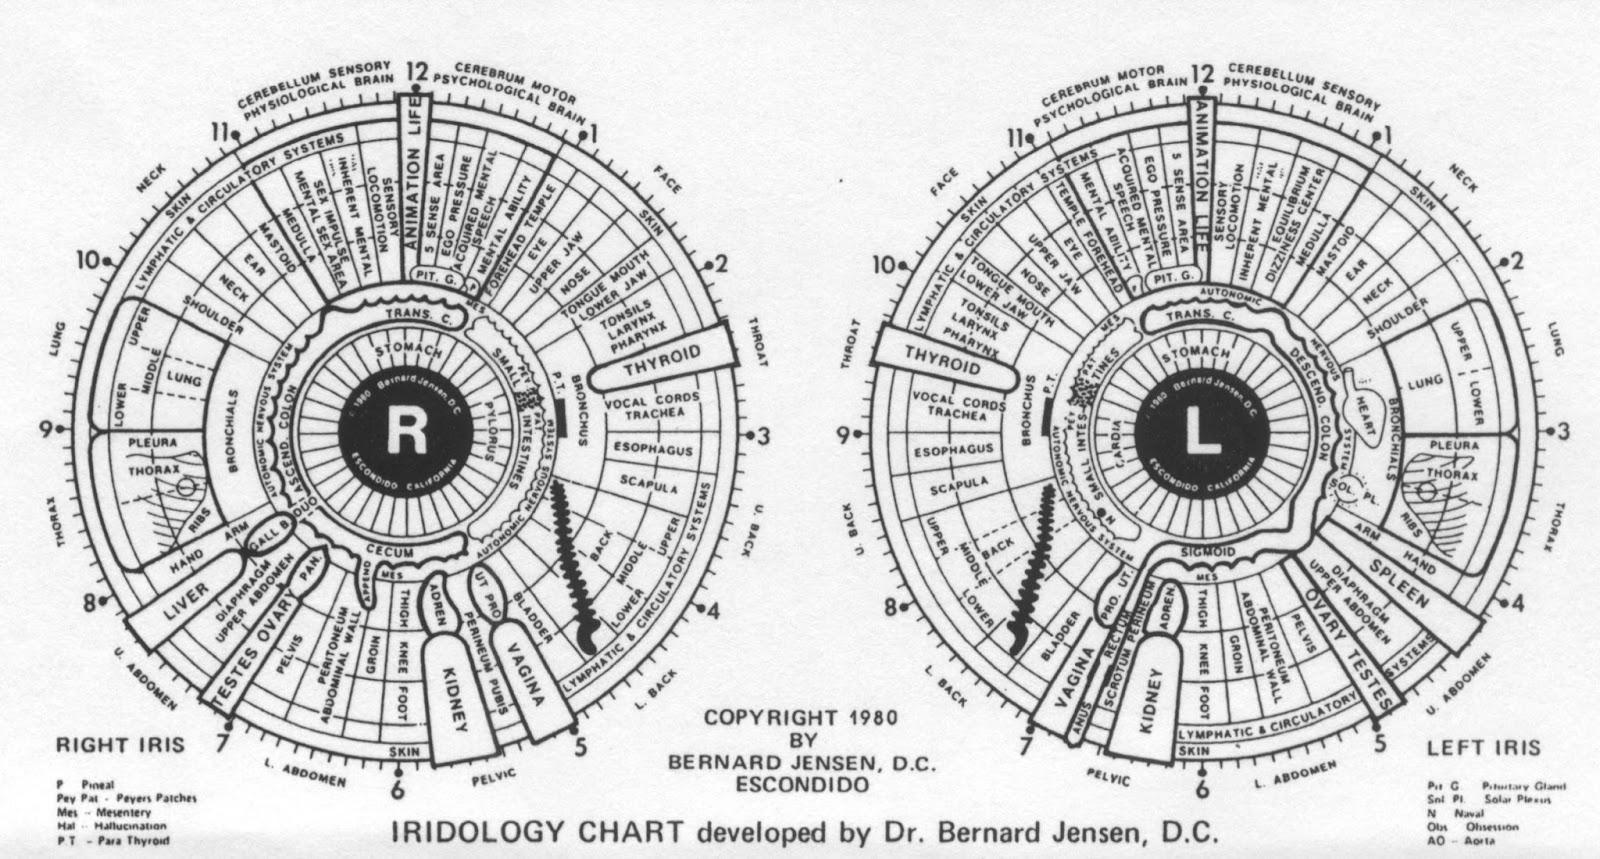 See the colon squiggle around pupil also multiple chemical survivor iridology rh multiplechemicalsurvivorspot